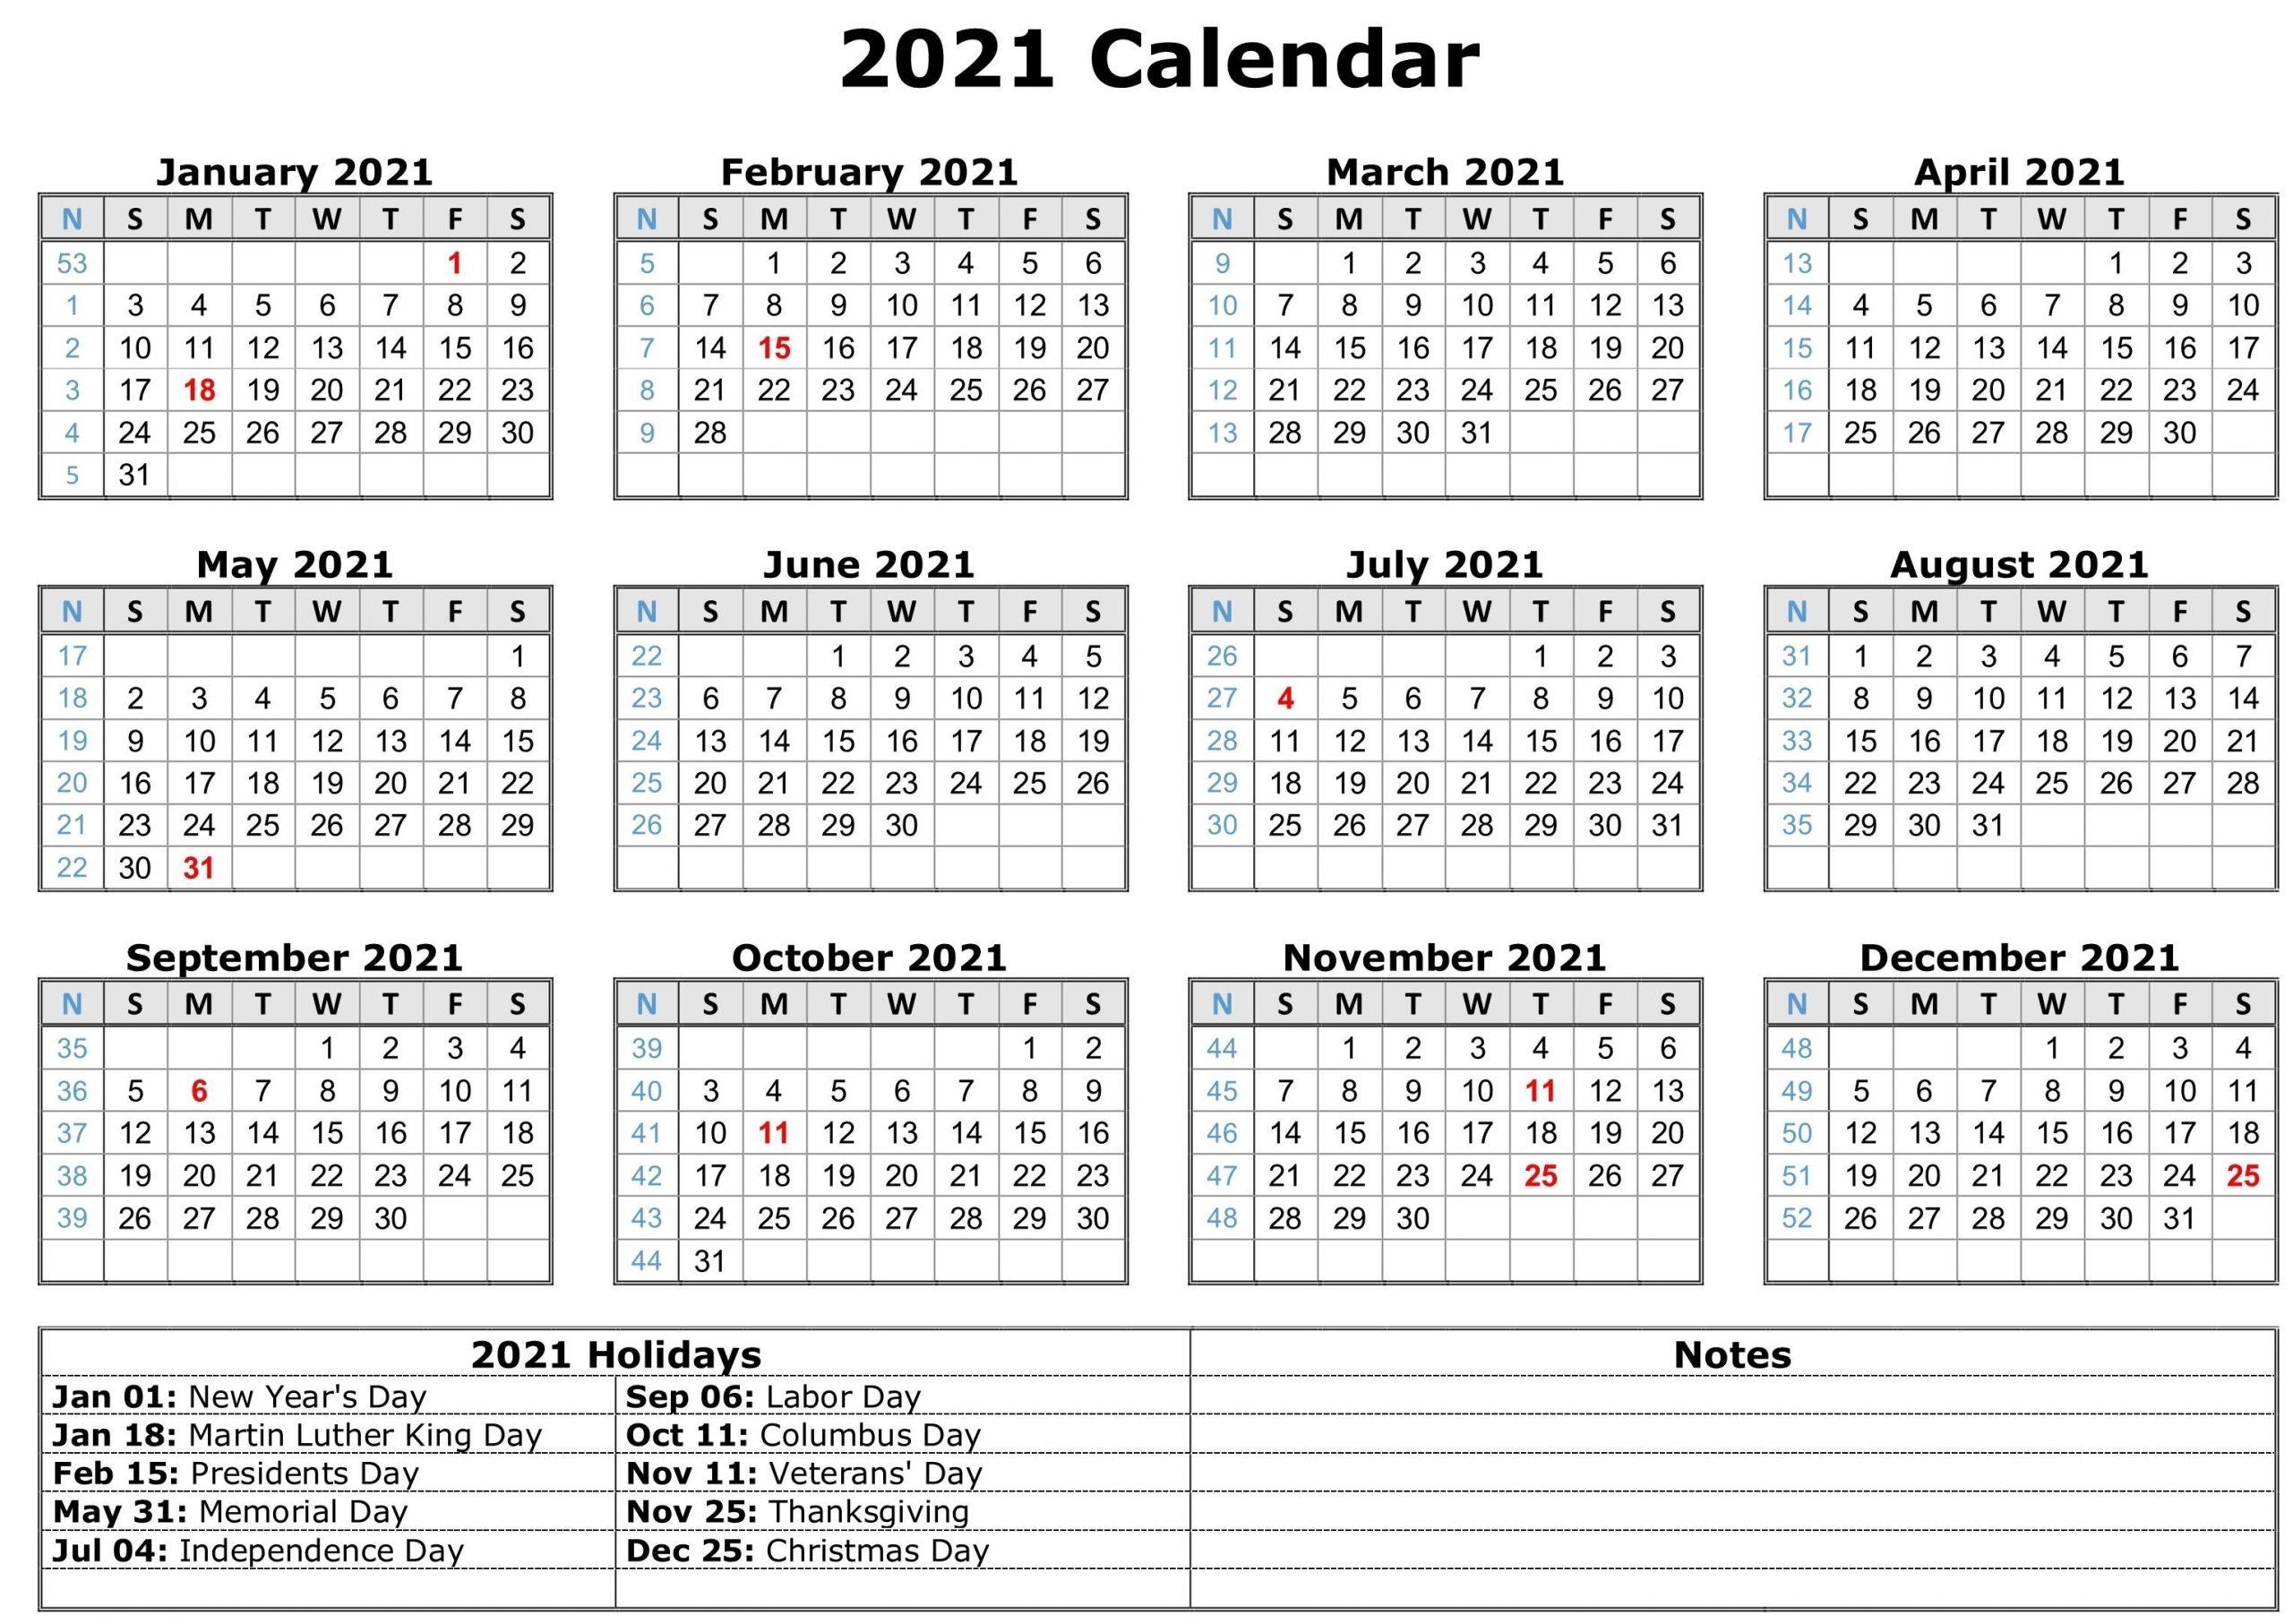 2021 Calendar With Holidays | Free Calendar Template